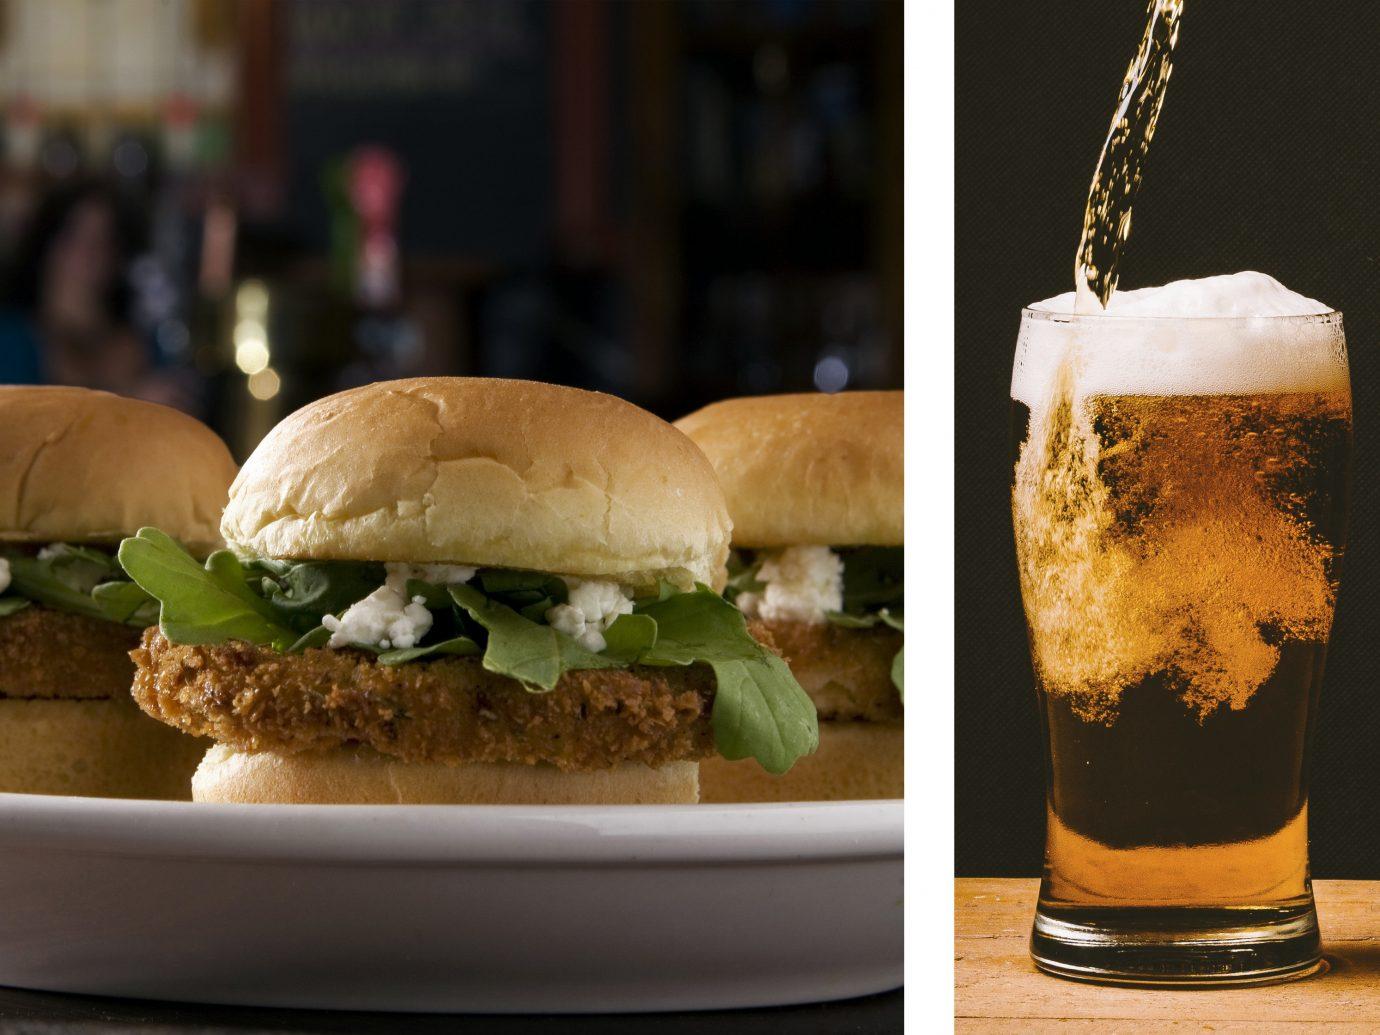 Food + Drink table food plate snack food sandwich dish restaurant hamburger sense fast food